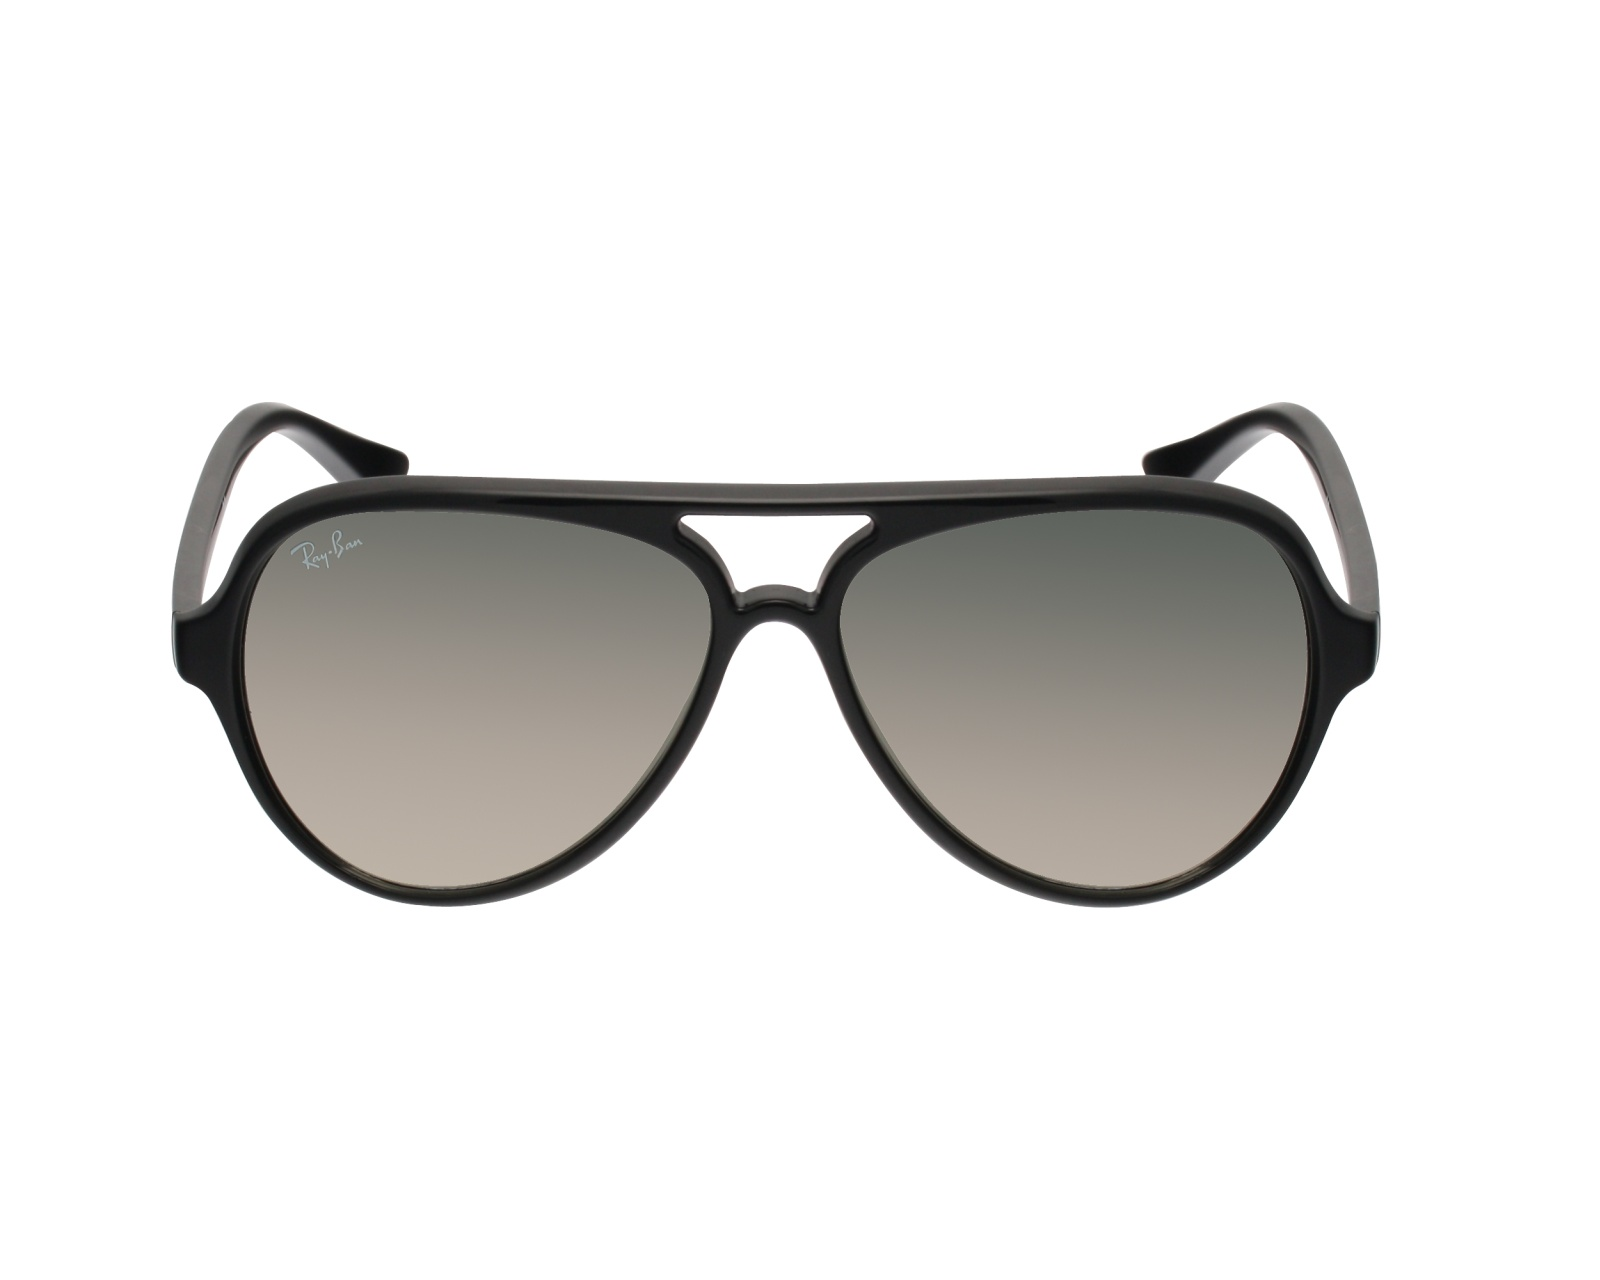 2b2753291 Sunglasses Ray-Ban RB-4125 601/32 59-14 Black profile view